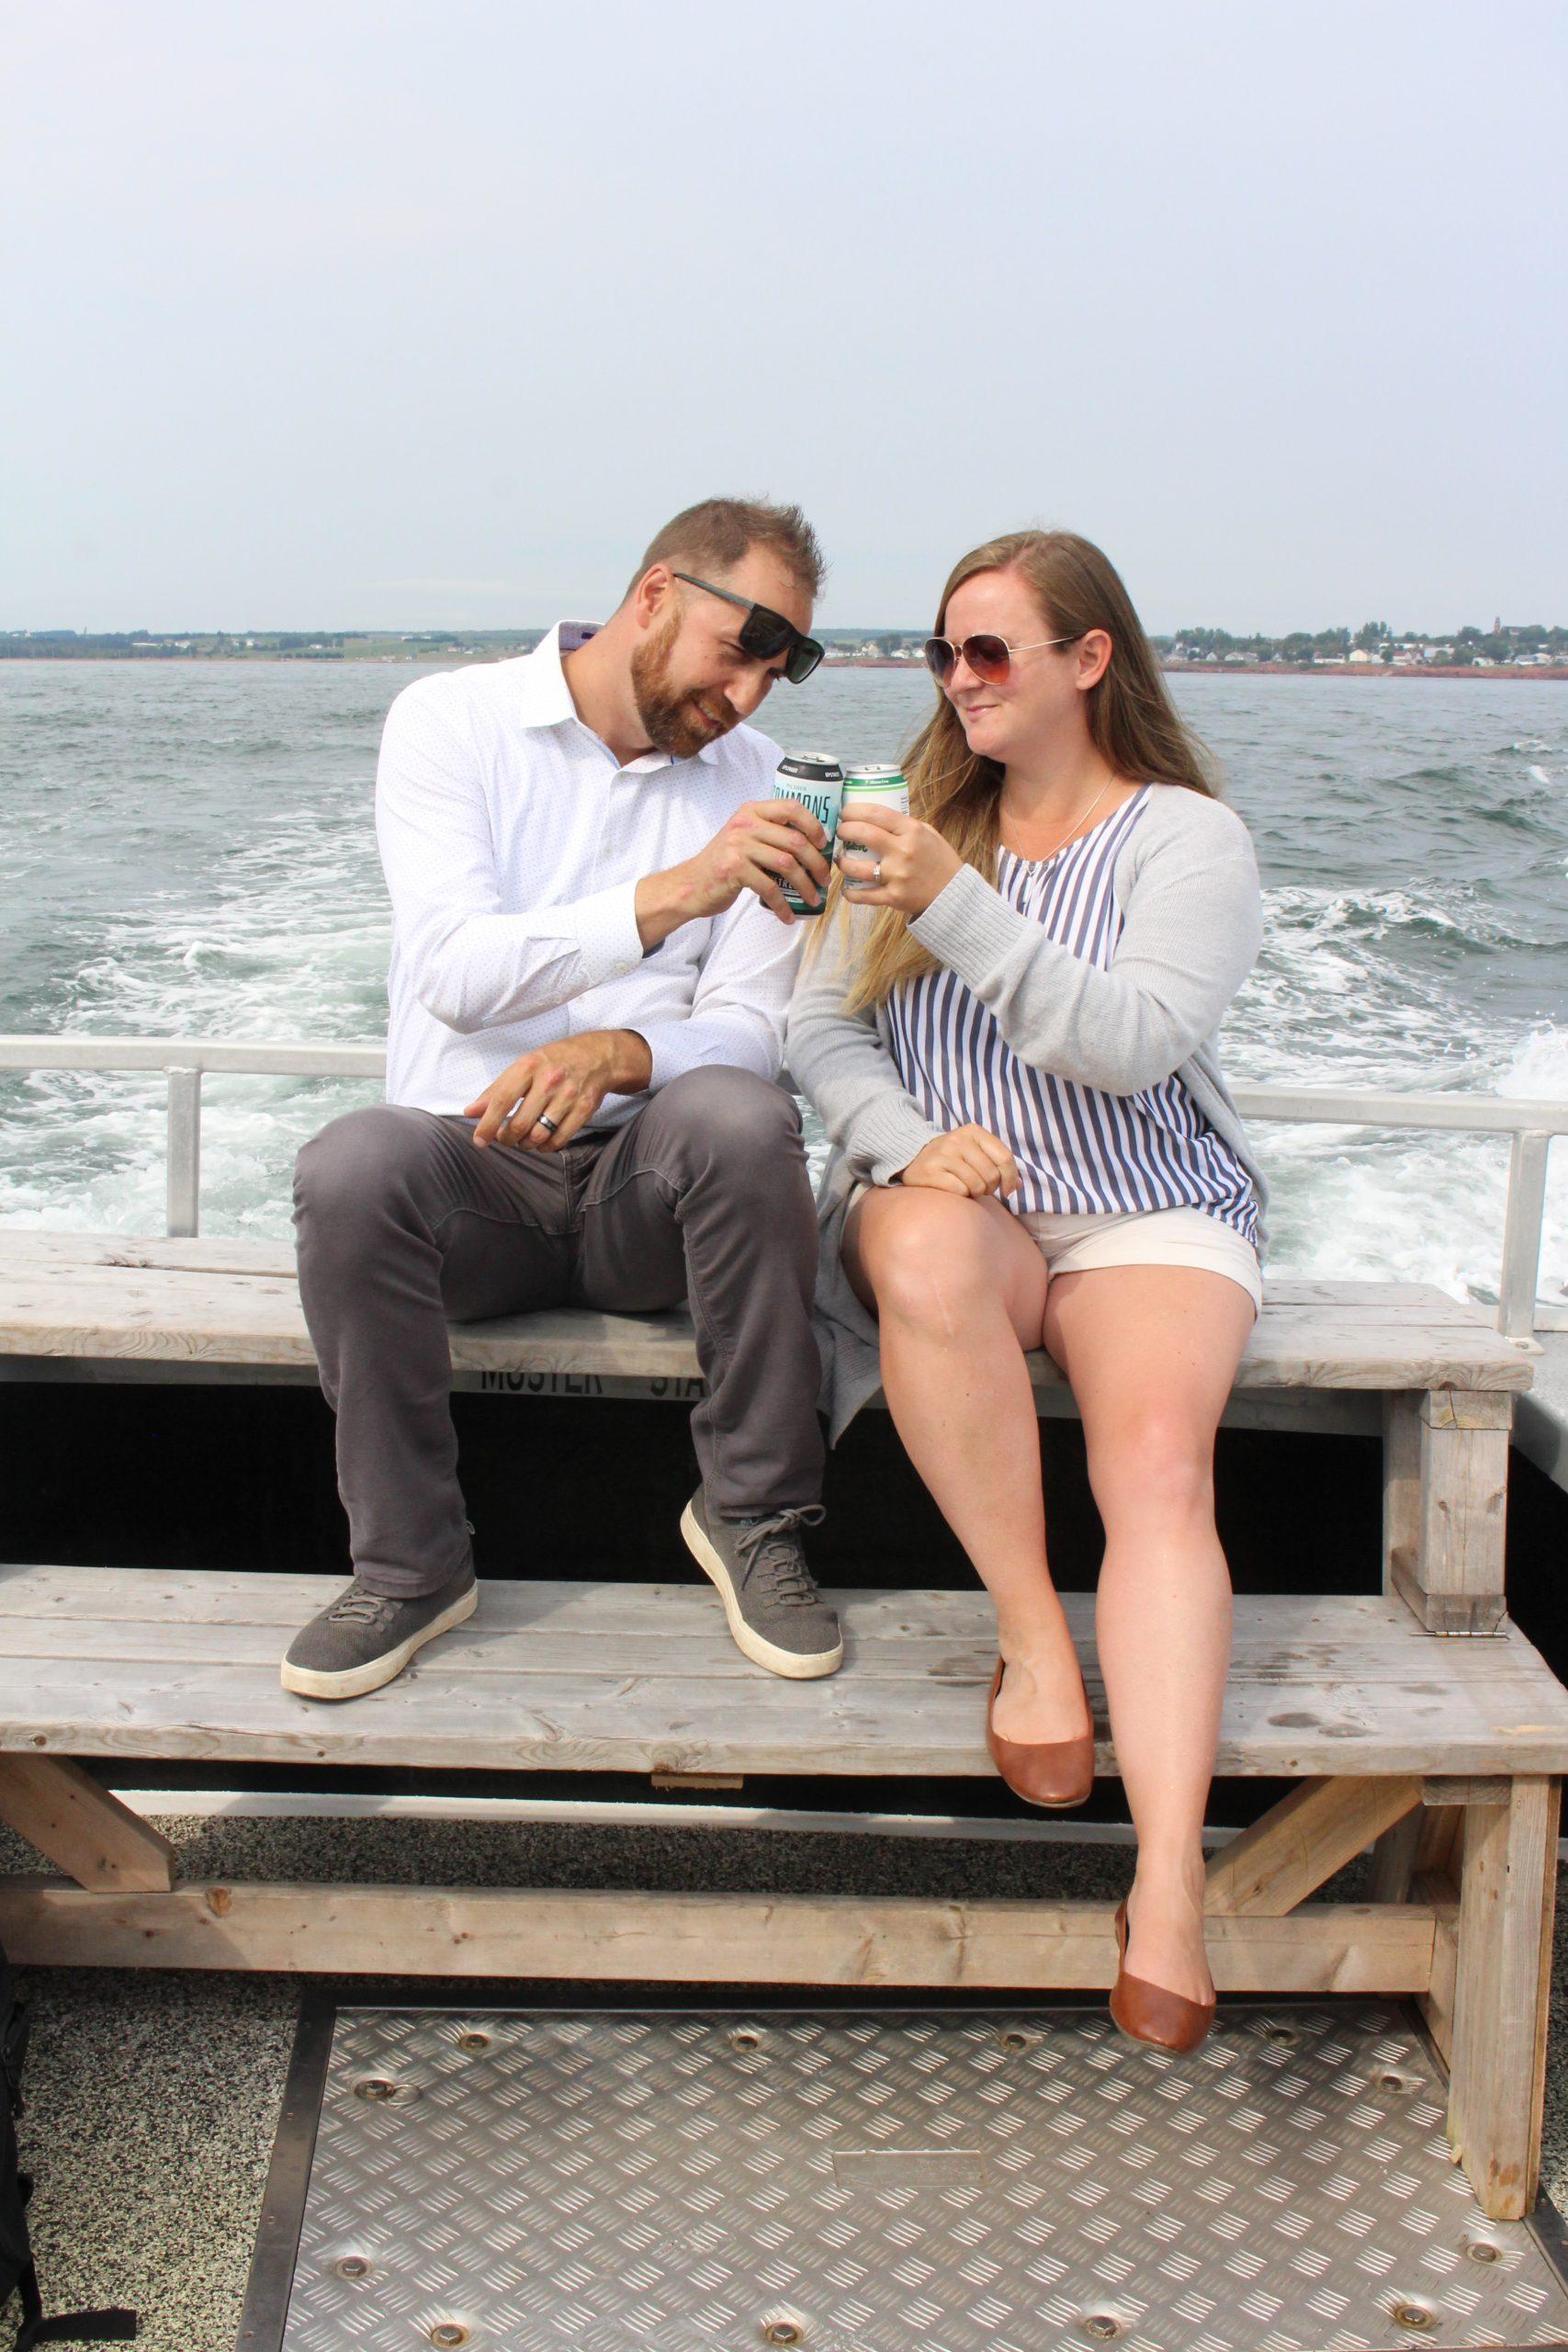 reasons to visit Prince Edward Island